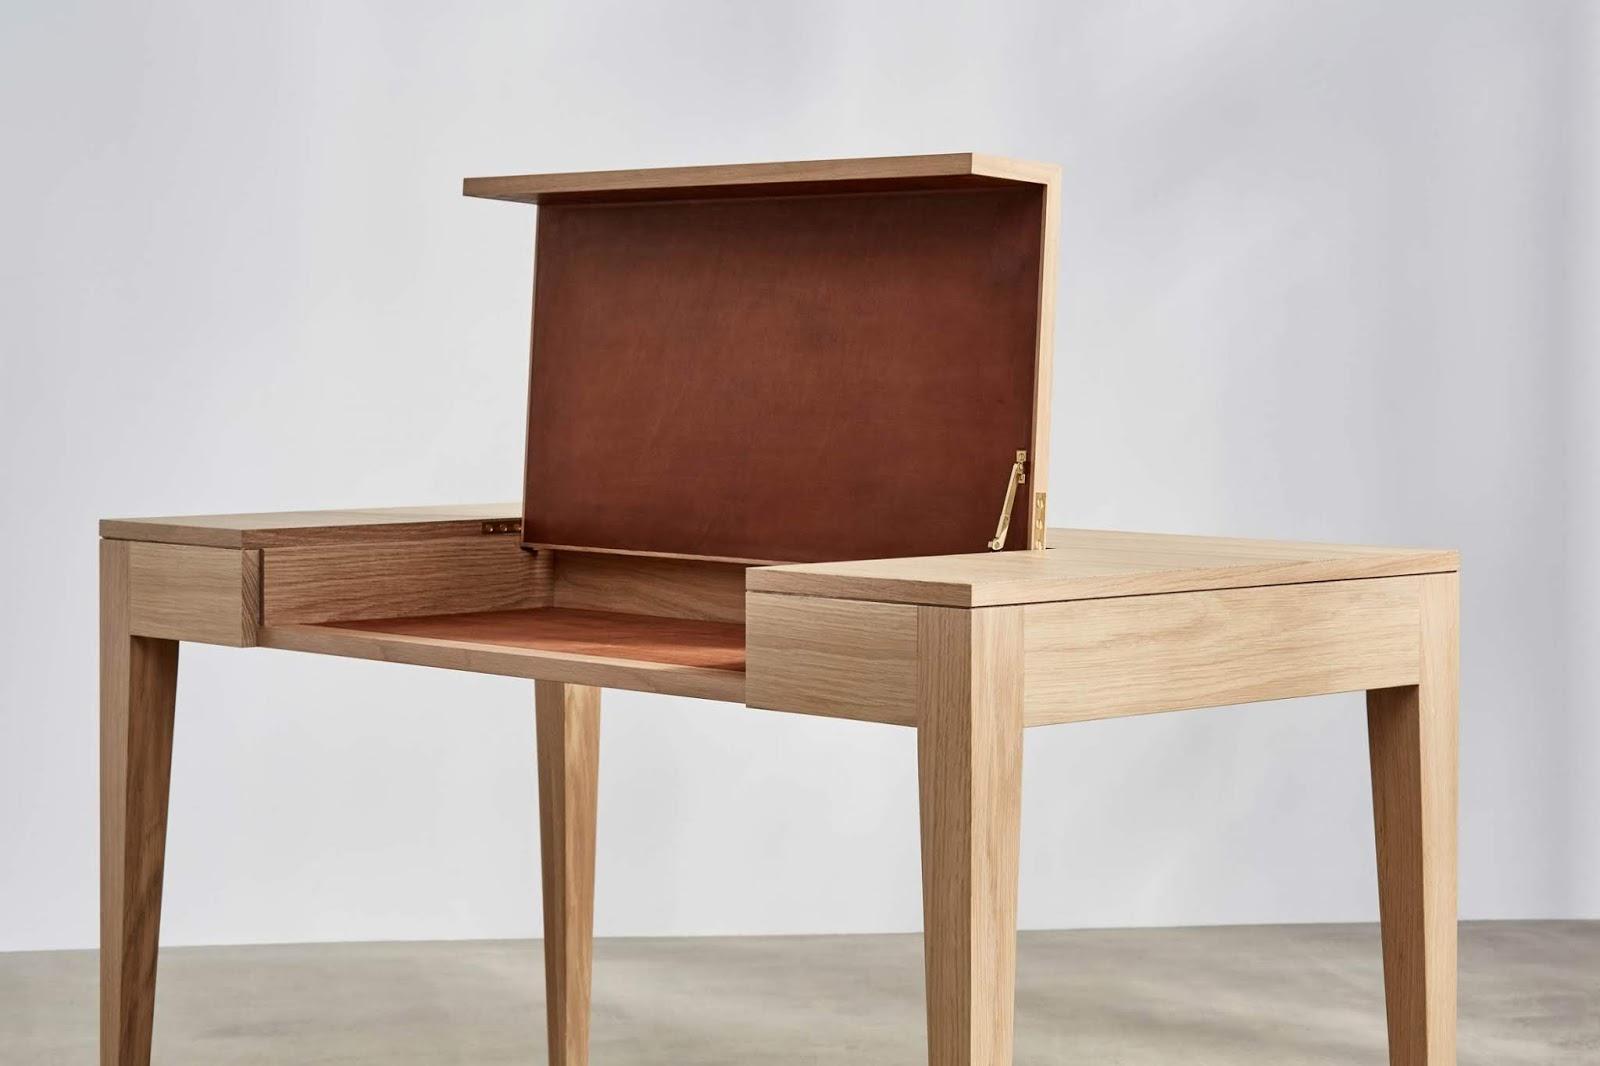 The Camberwell desk